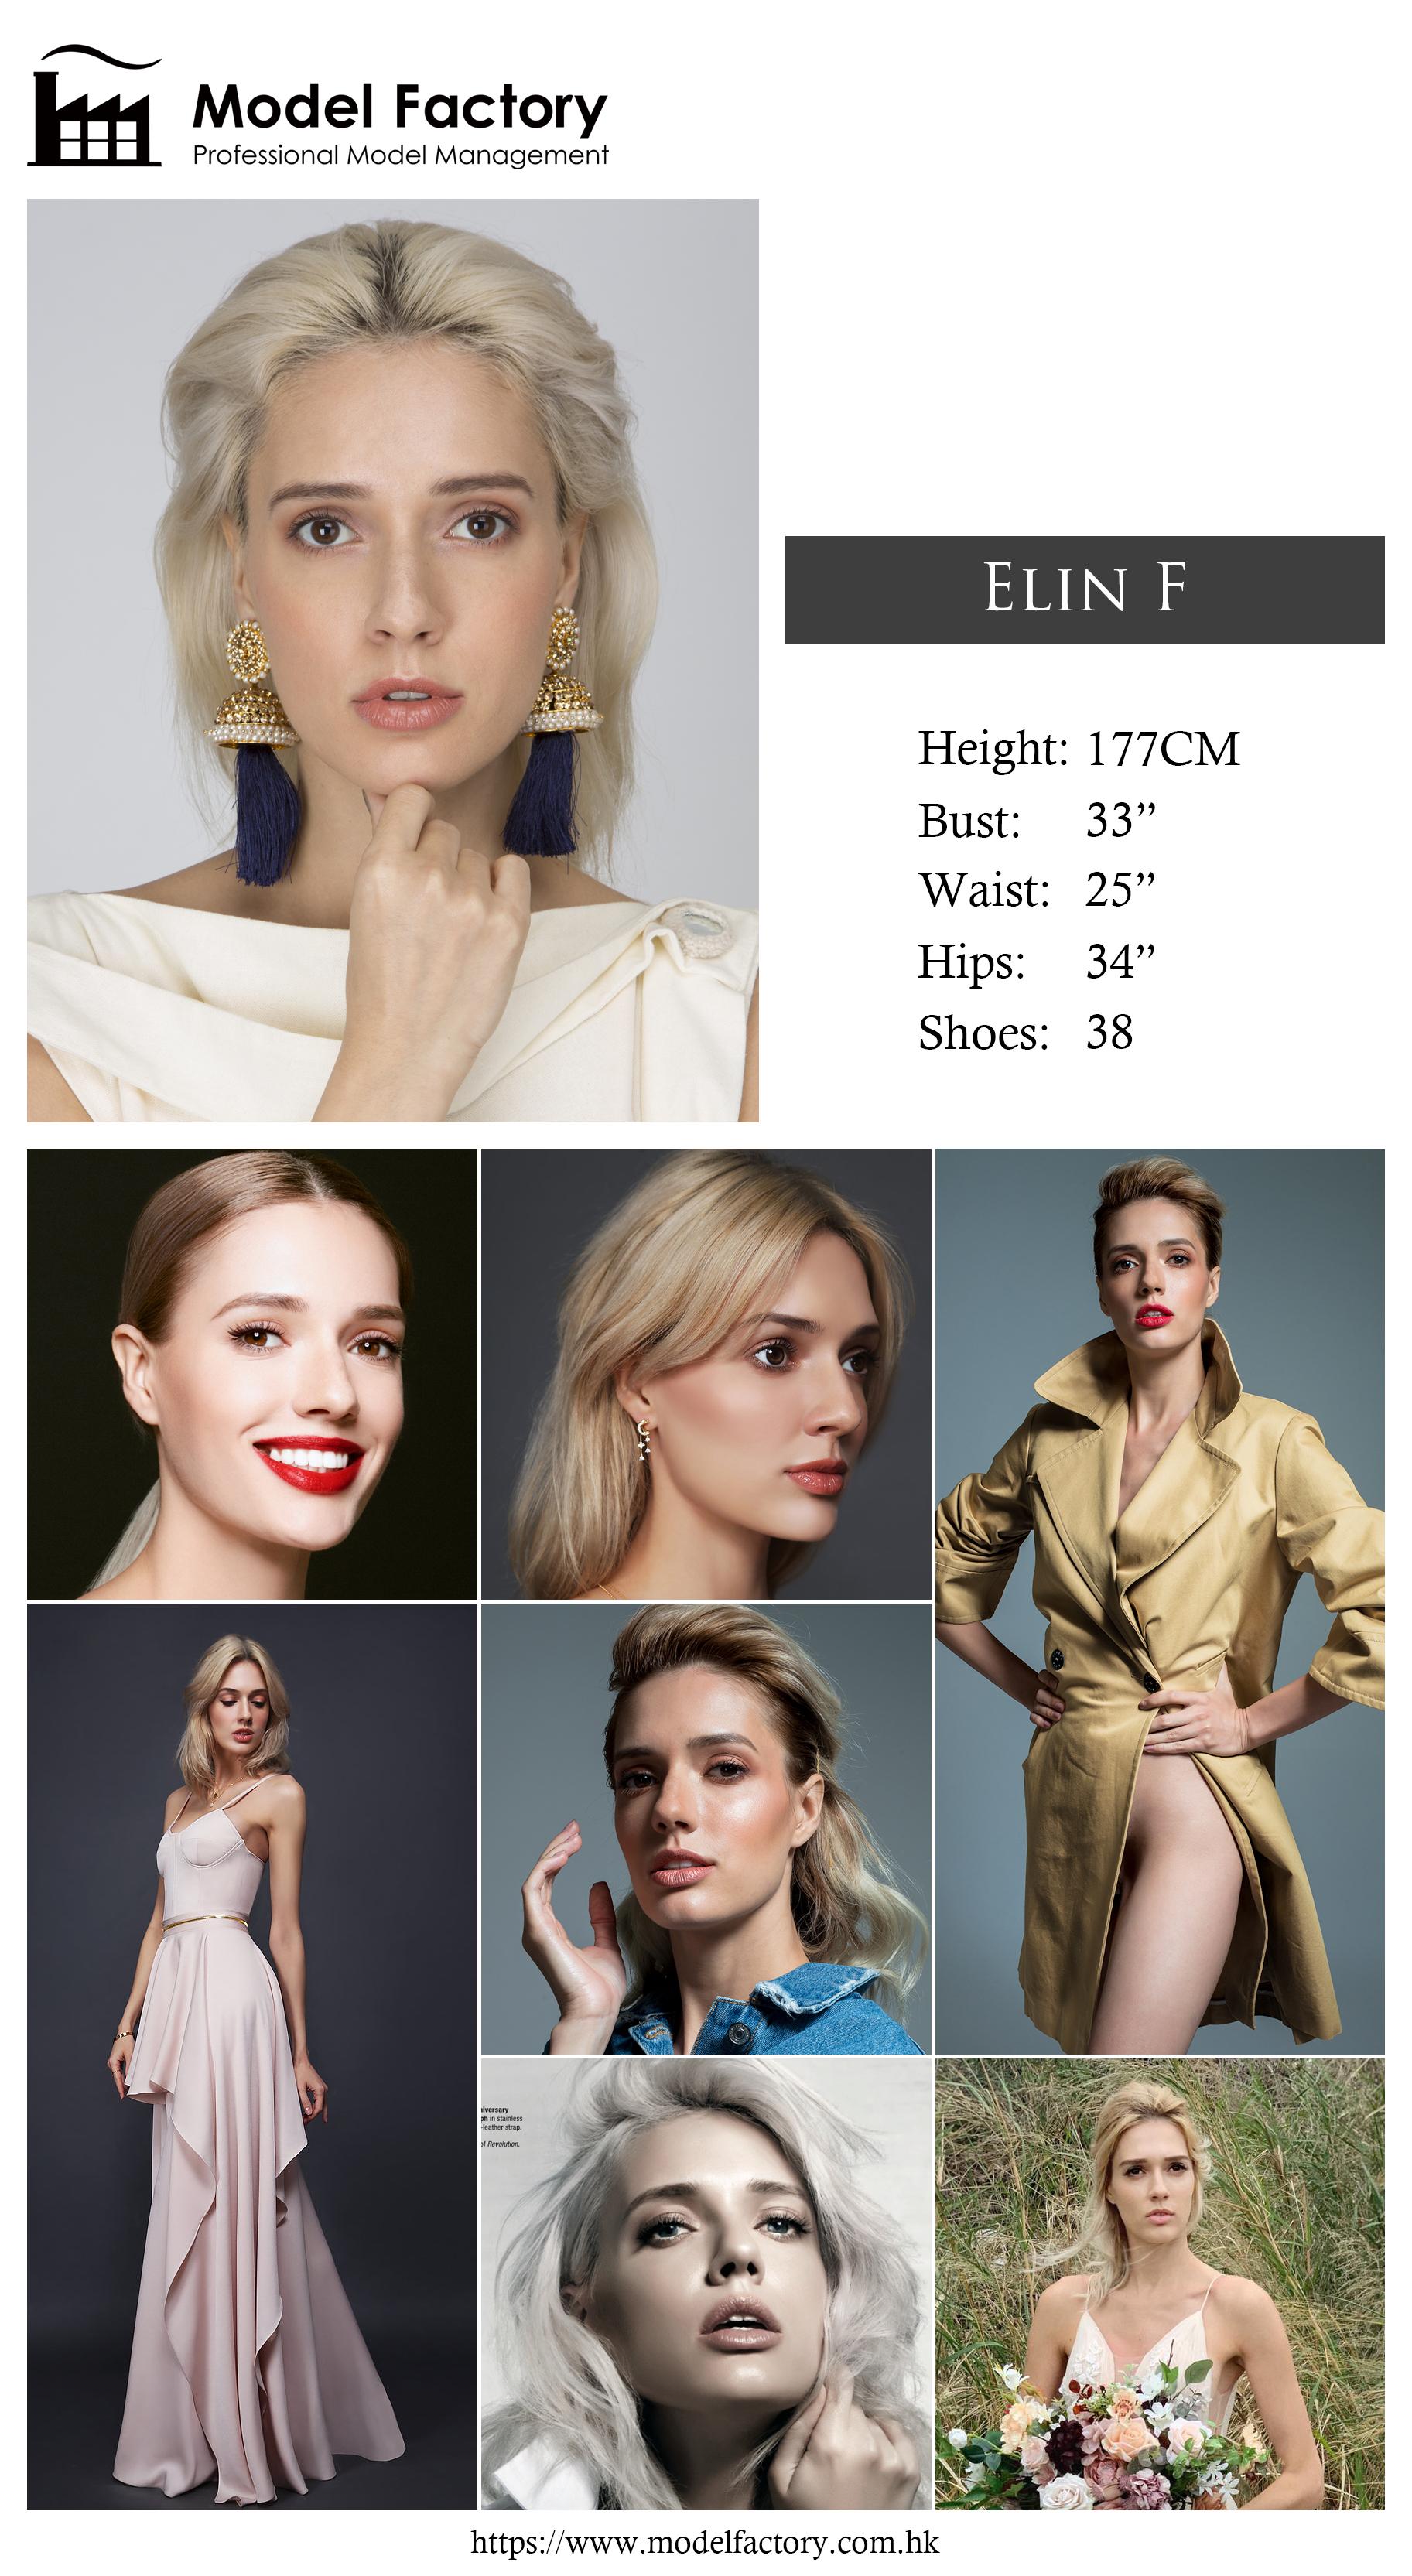 Model Factory Caucasian Female Model ElinF